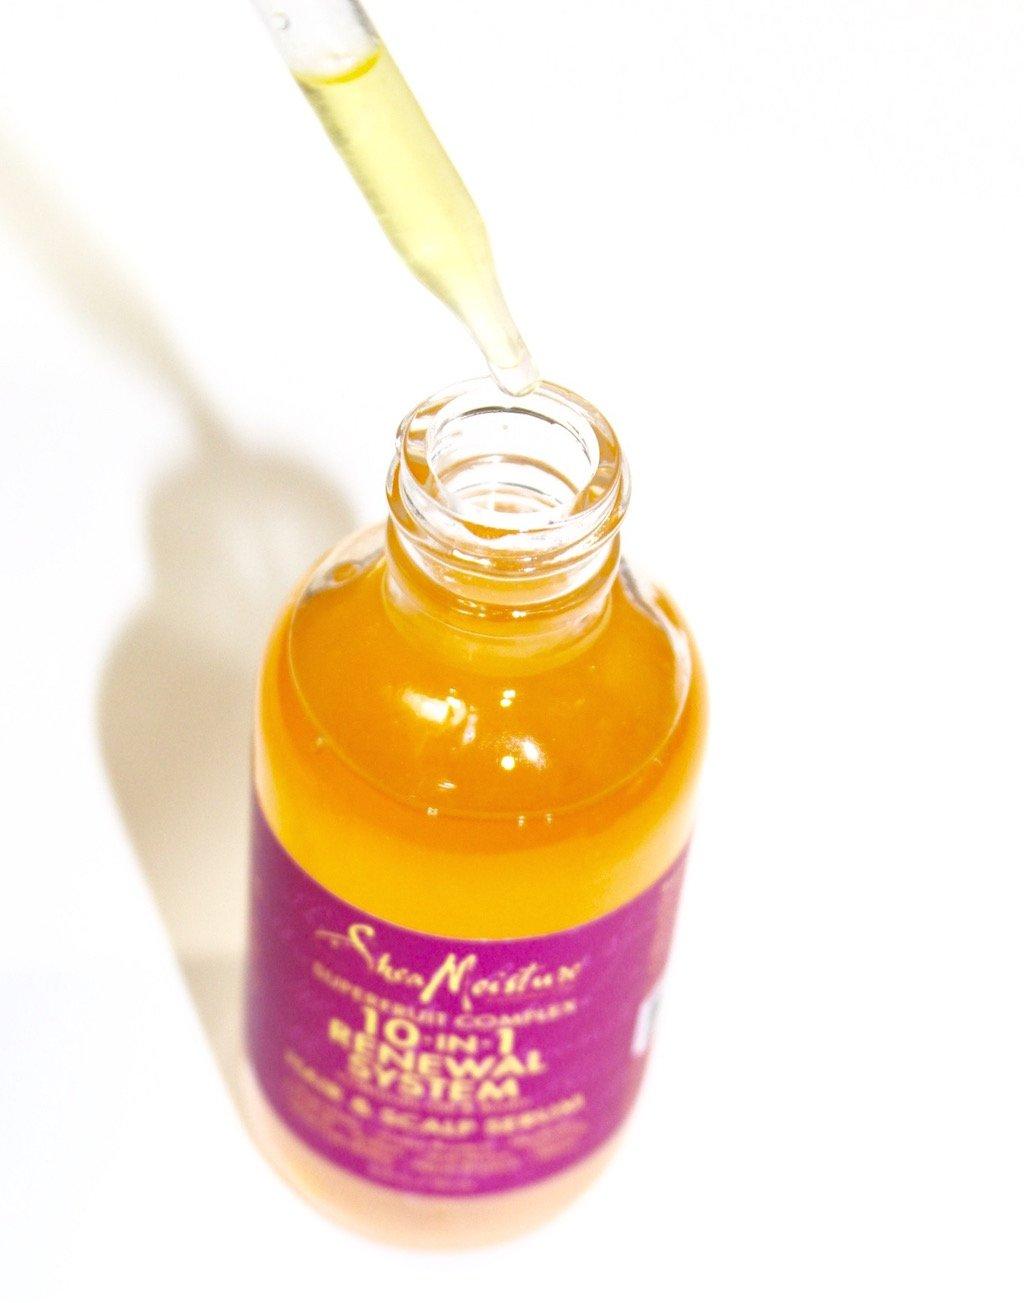 sheamoisture superfruit complex 10-in-1 renewal hair & scalp serum